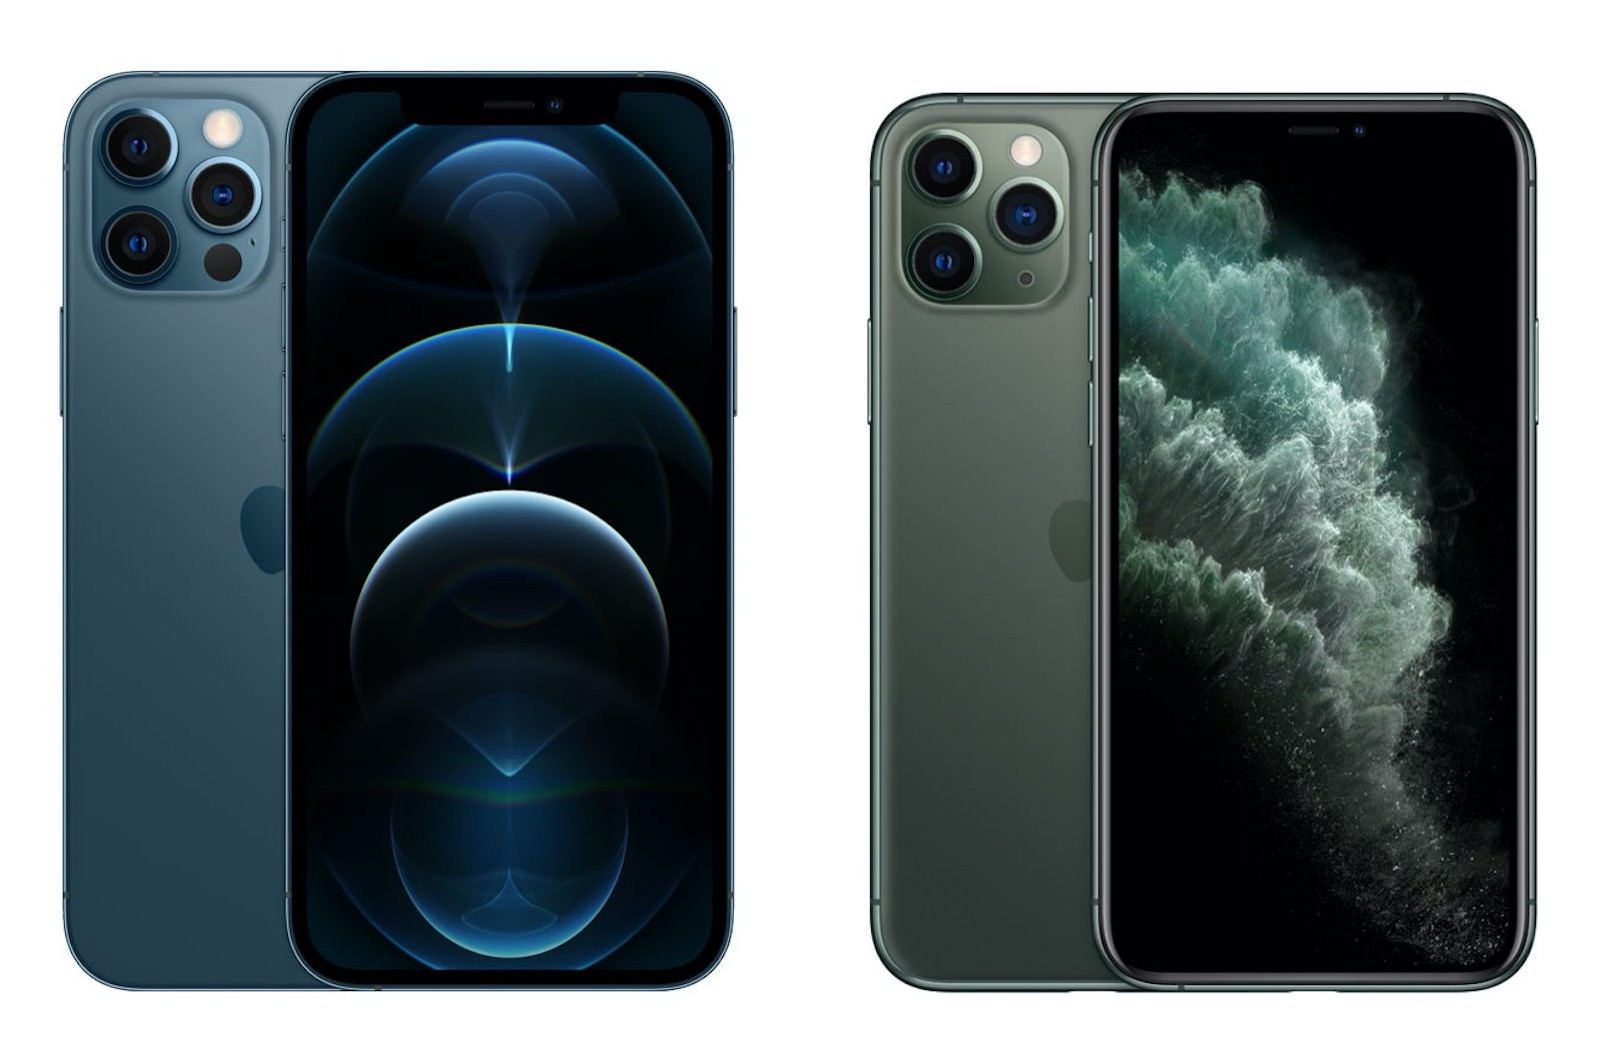 Iphone 12 pro vs iphone 11 pro